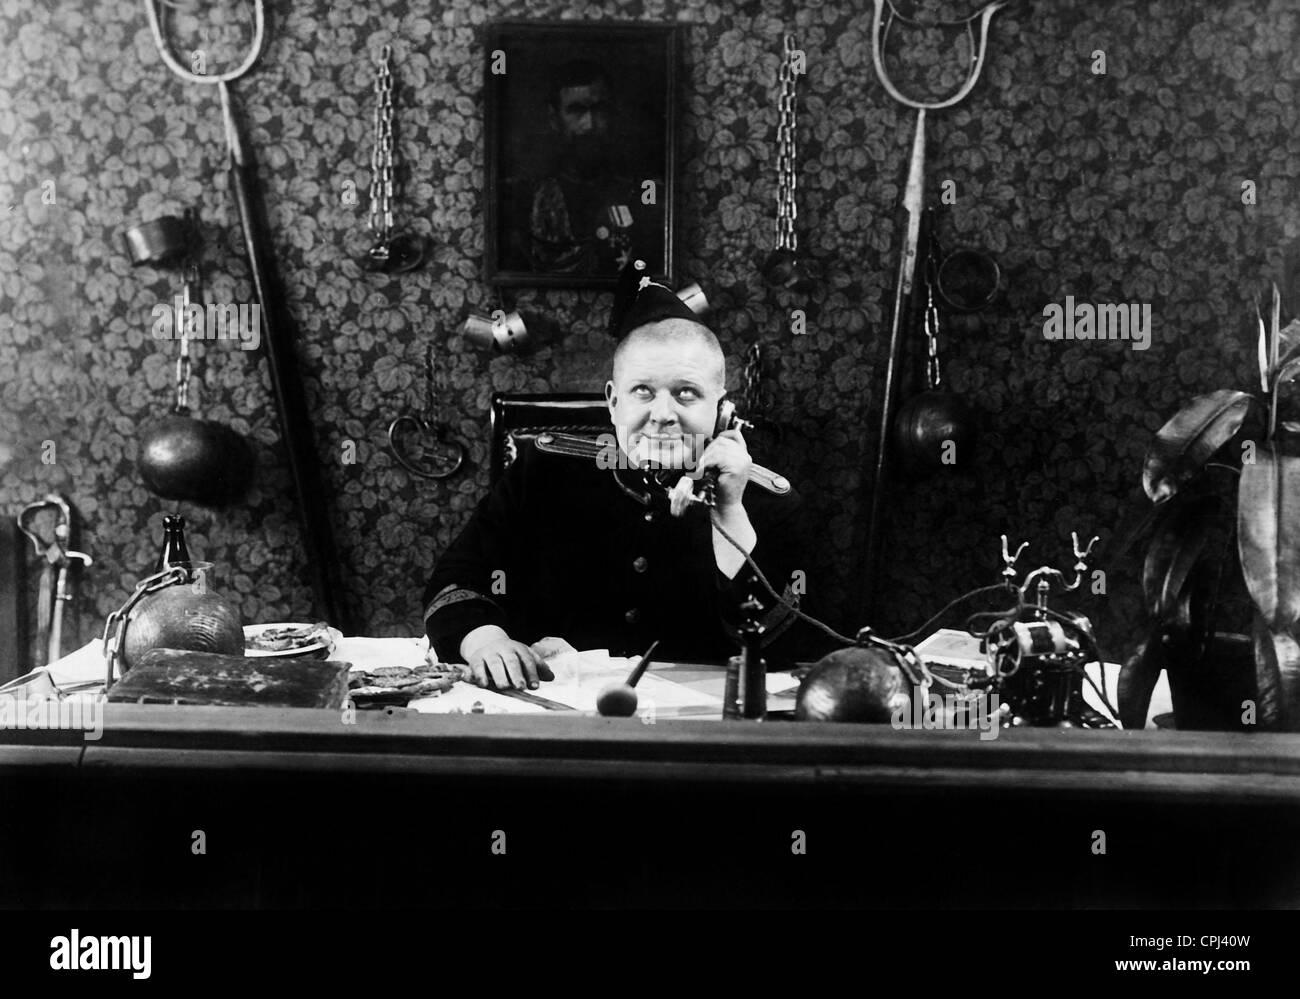 Movie scene with Harald Madsen - Stock Image